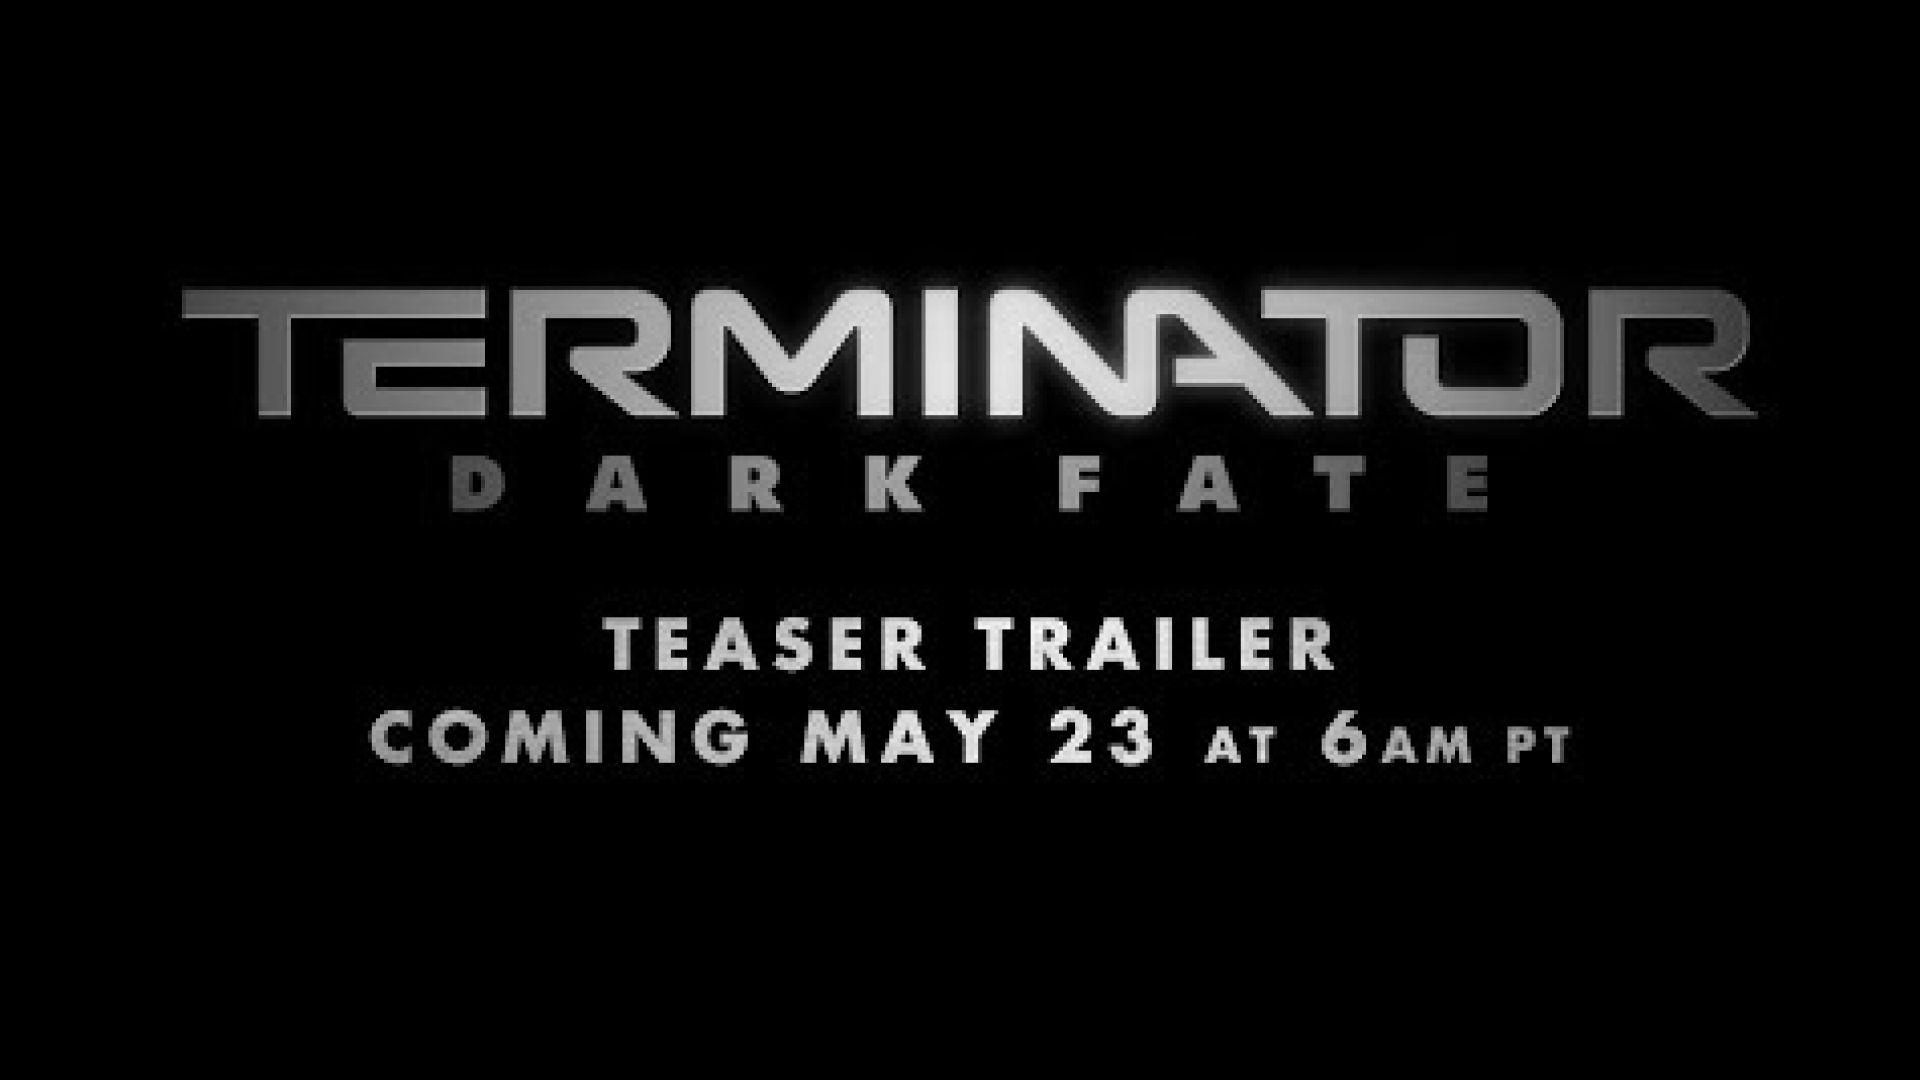 Terminator: Dark Fate Teaser - Paramount Pictures